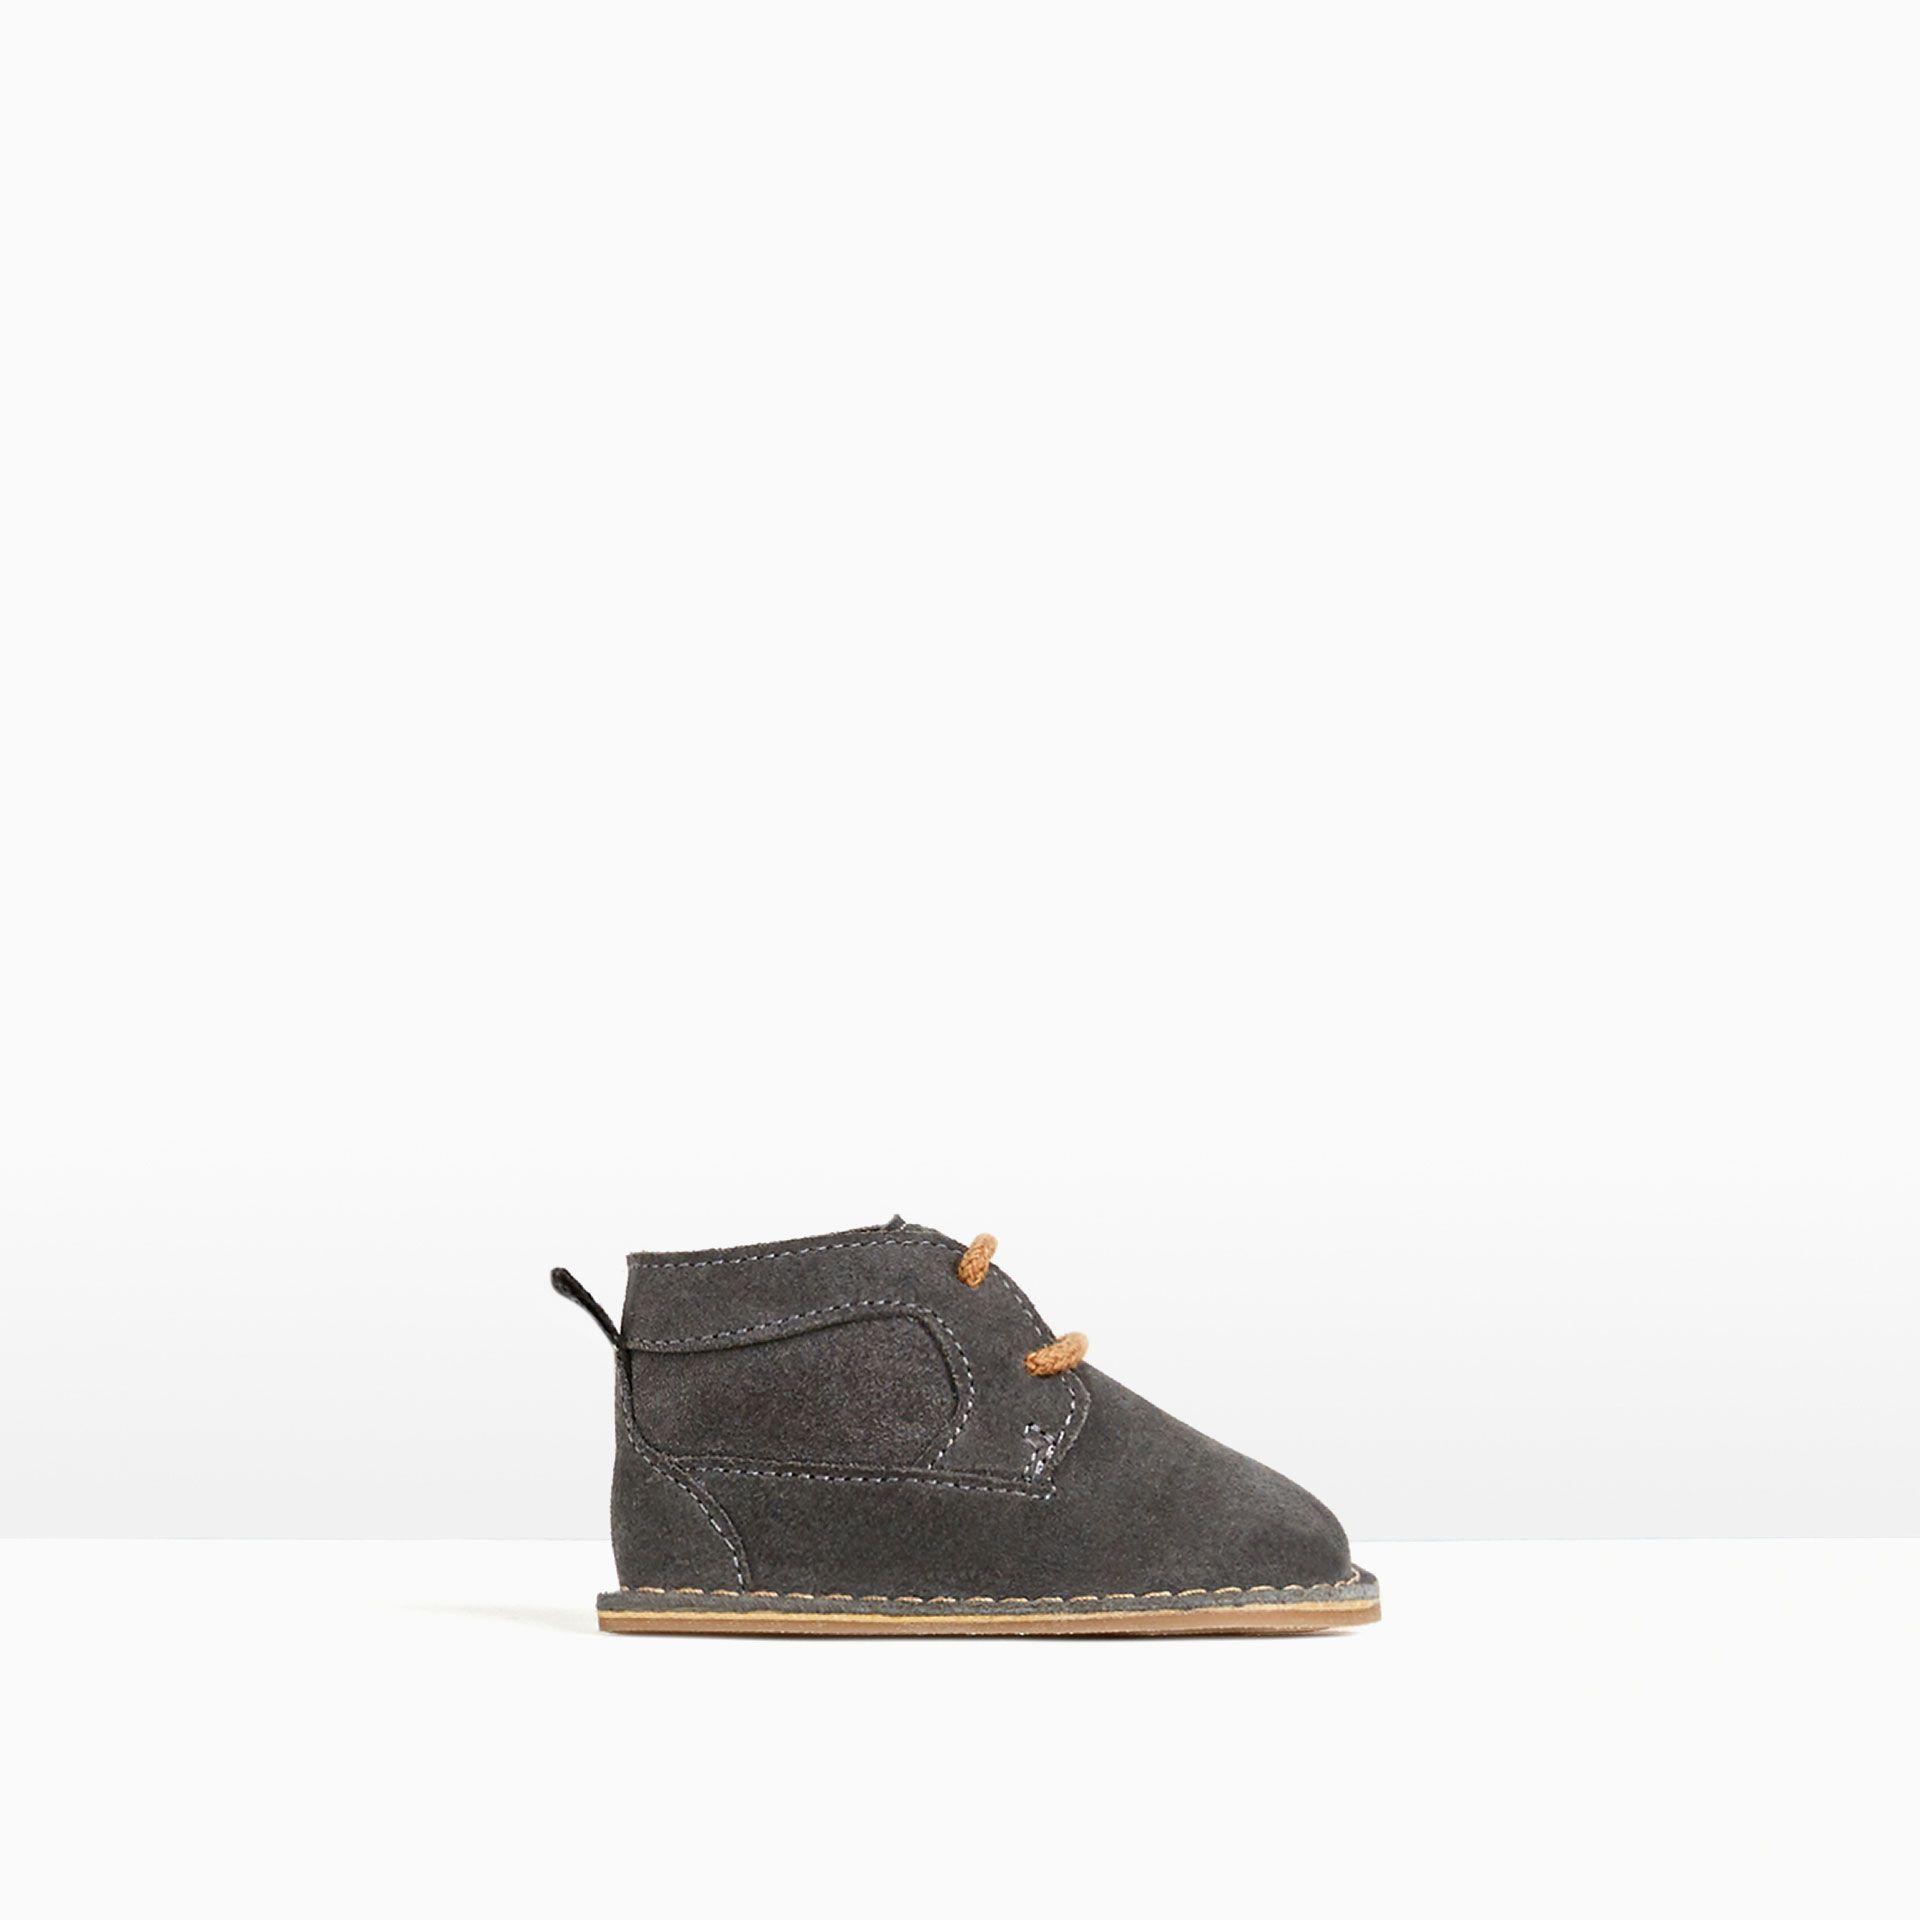 Skorzane Sznurowane Kozaki Boots Leather Lace Up Boots Dress Shoes Men